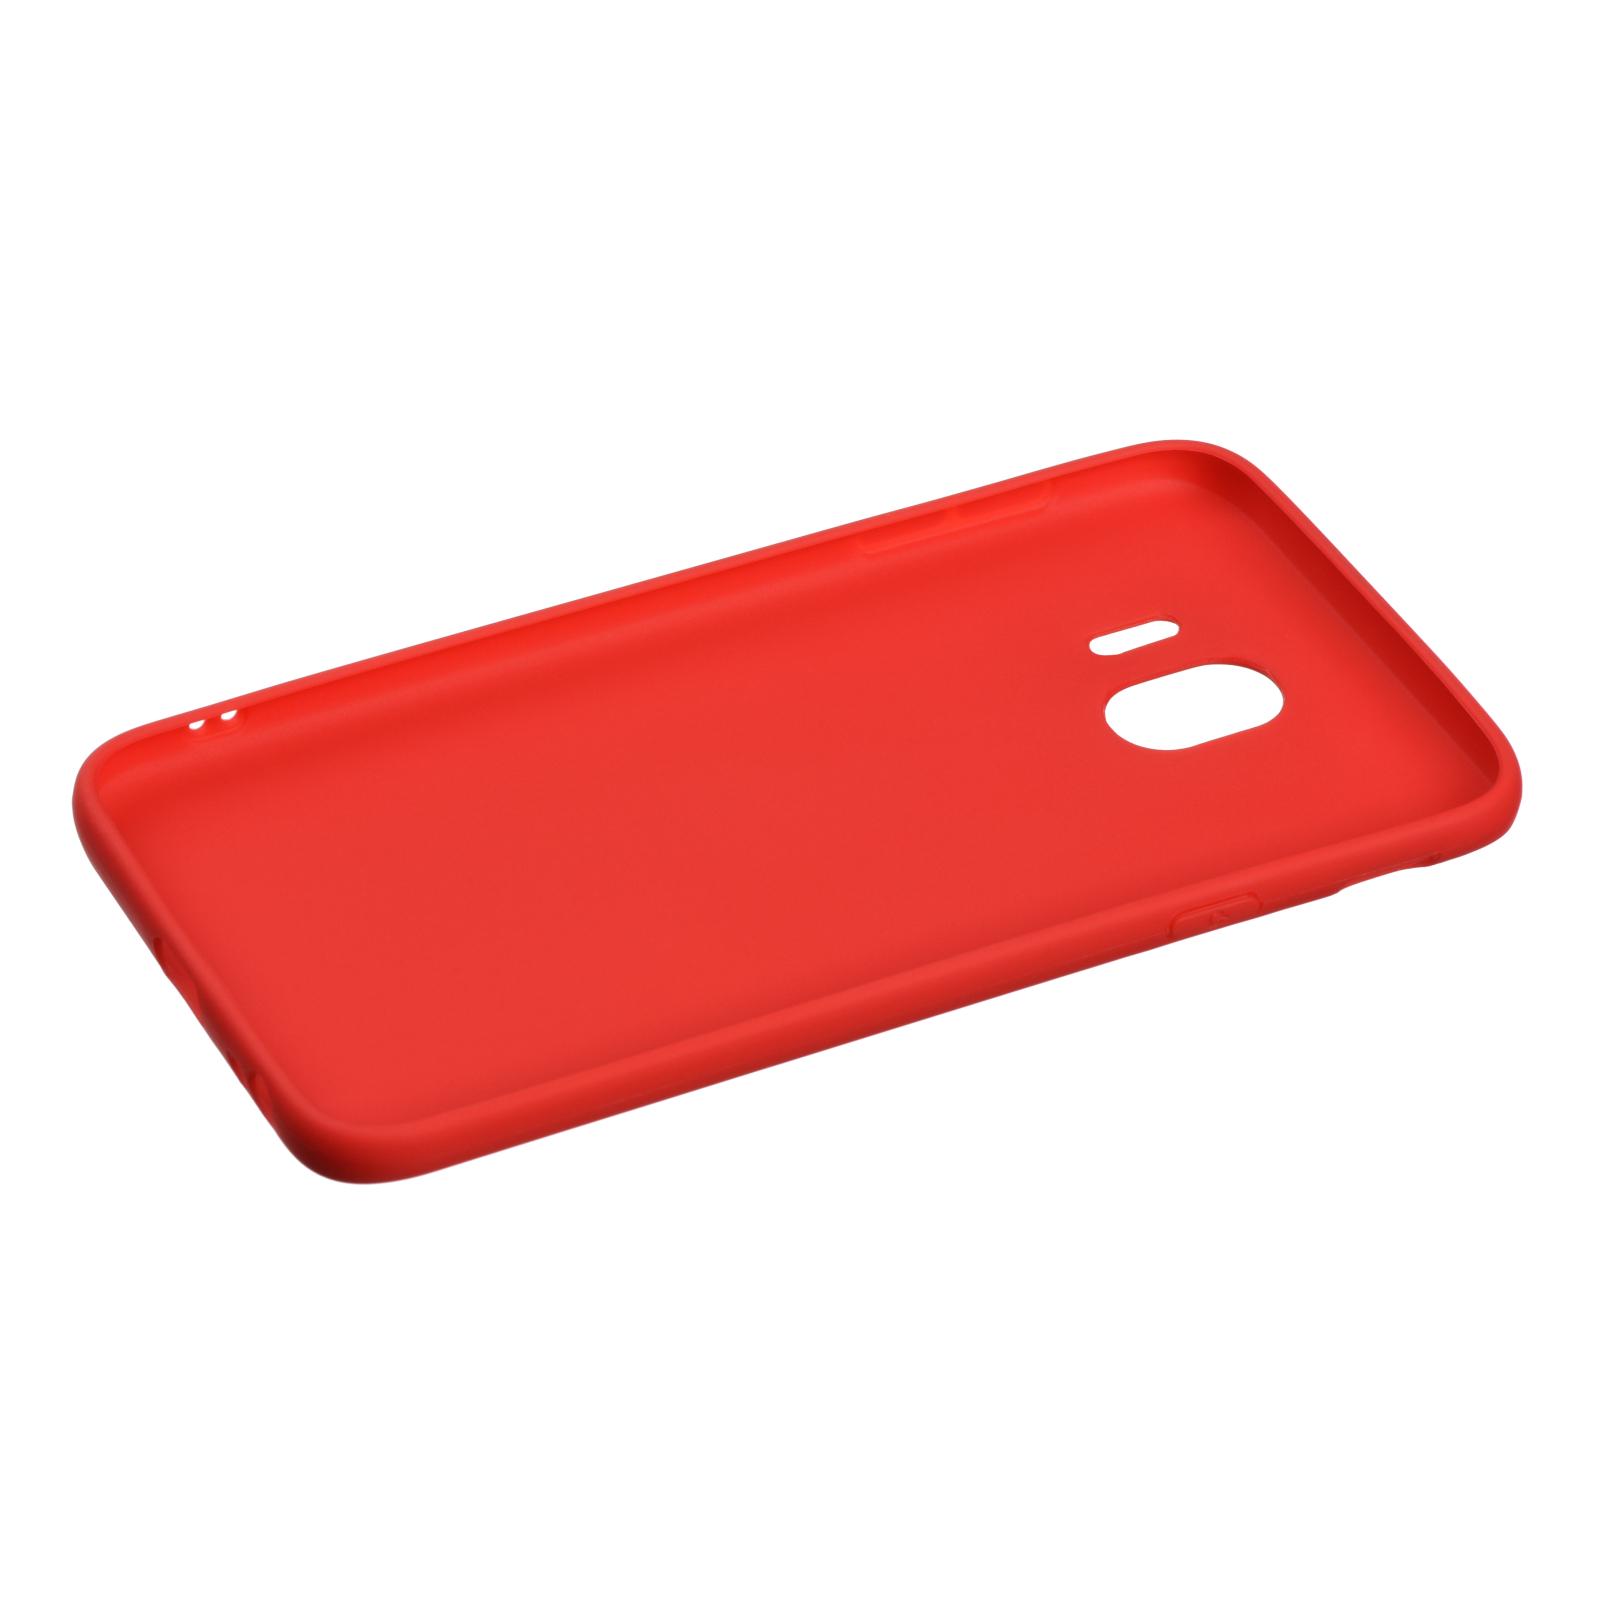 Чохол до моб. телефона 2E Samsung Galaxy J4 2018 (J400) , Soft touch, Red (2E-G-J4-18-NKST-RD) зображення 2